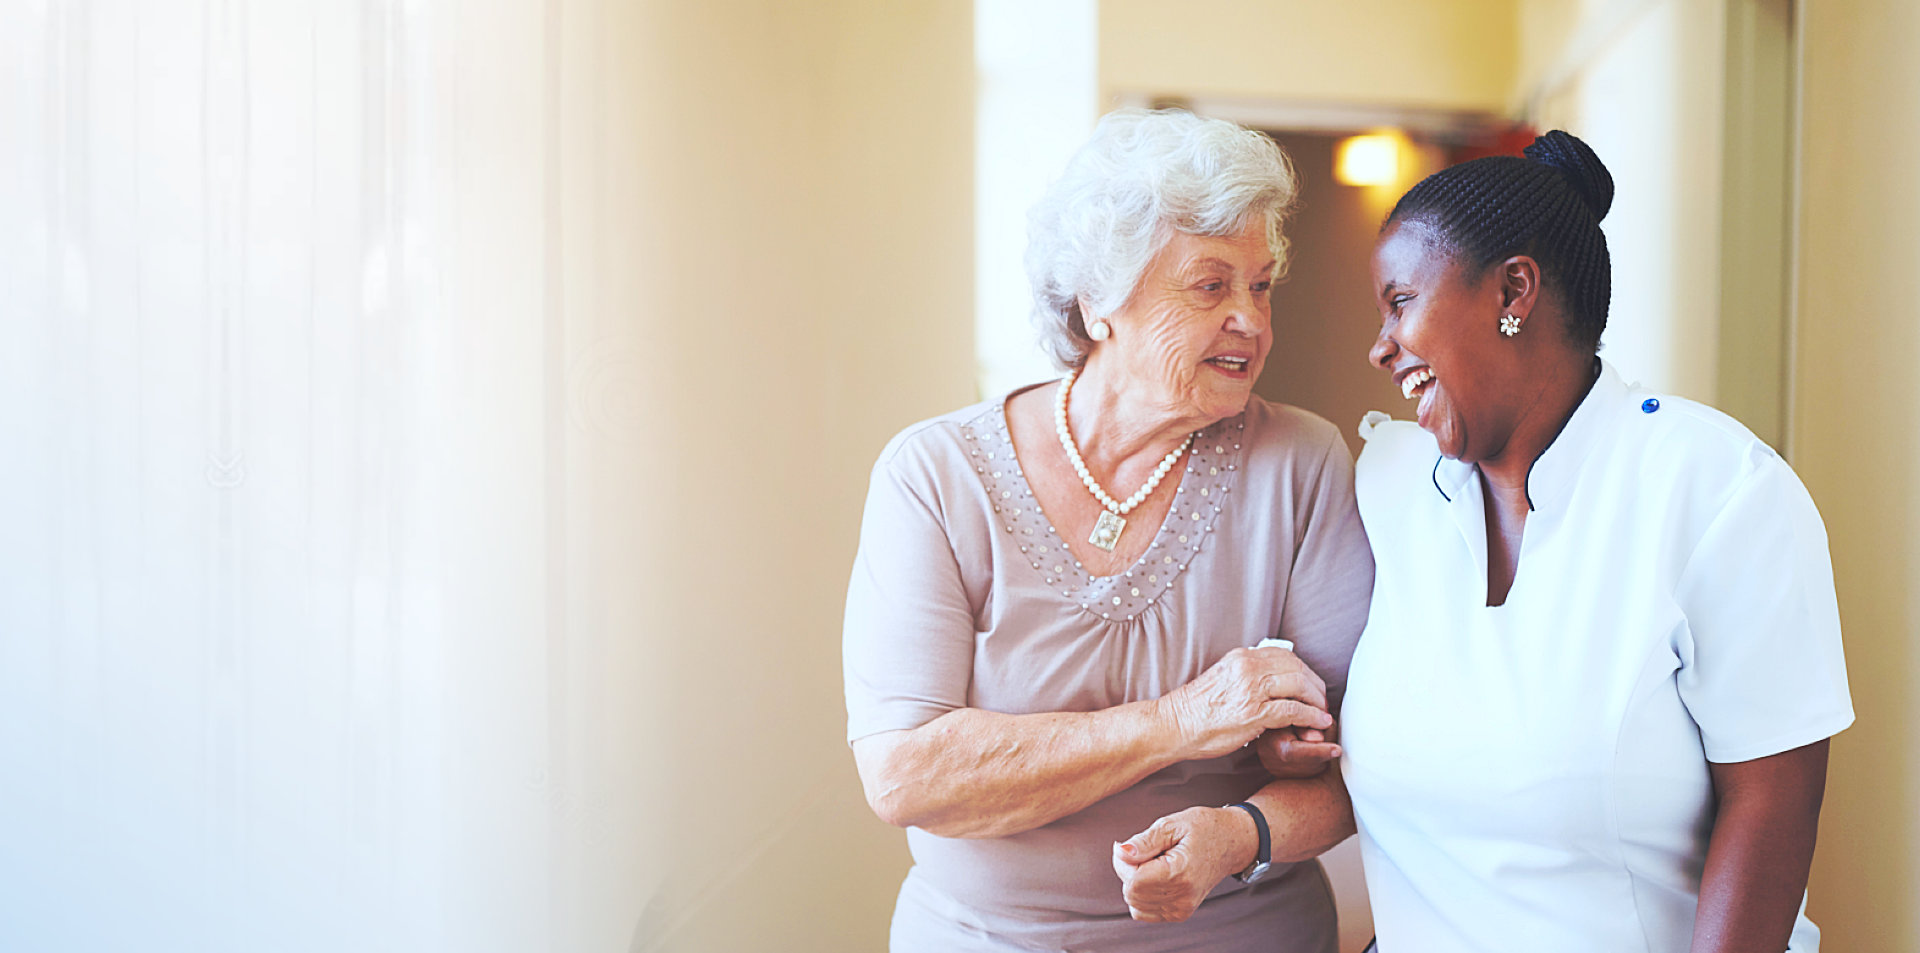 caregiver and senior woman talking while walking